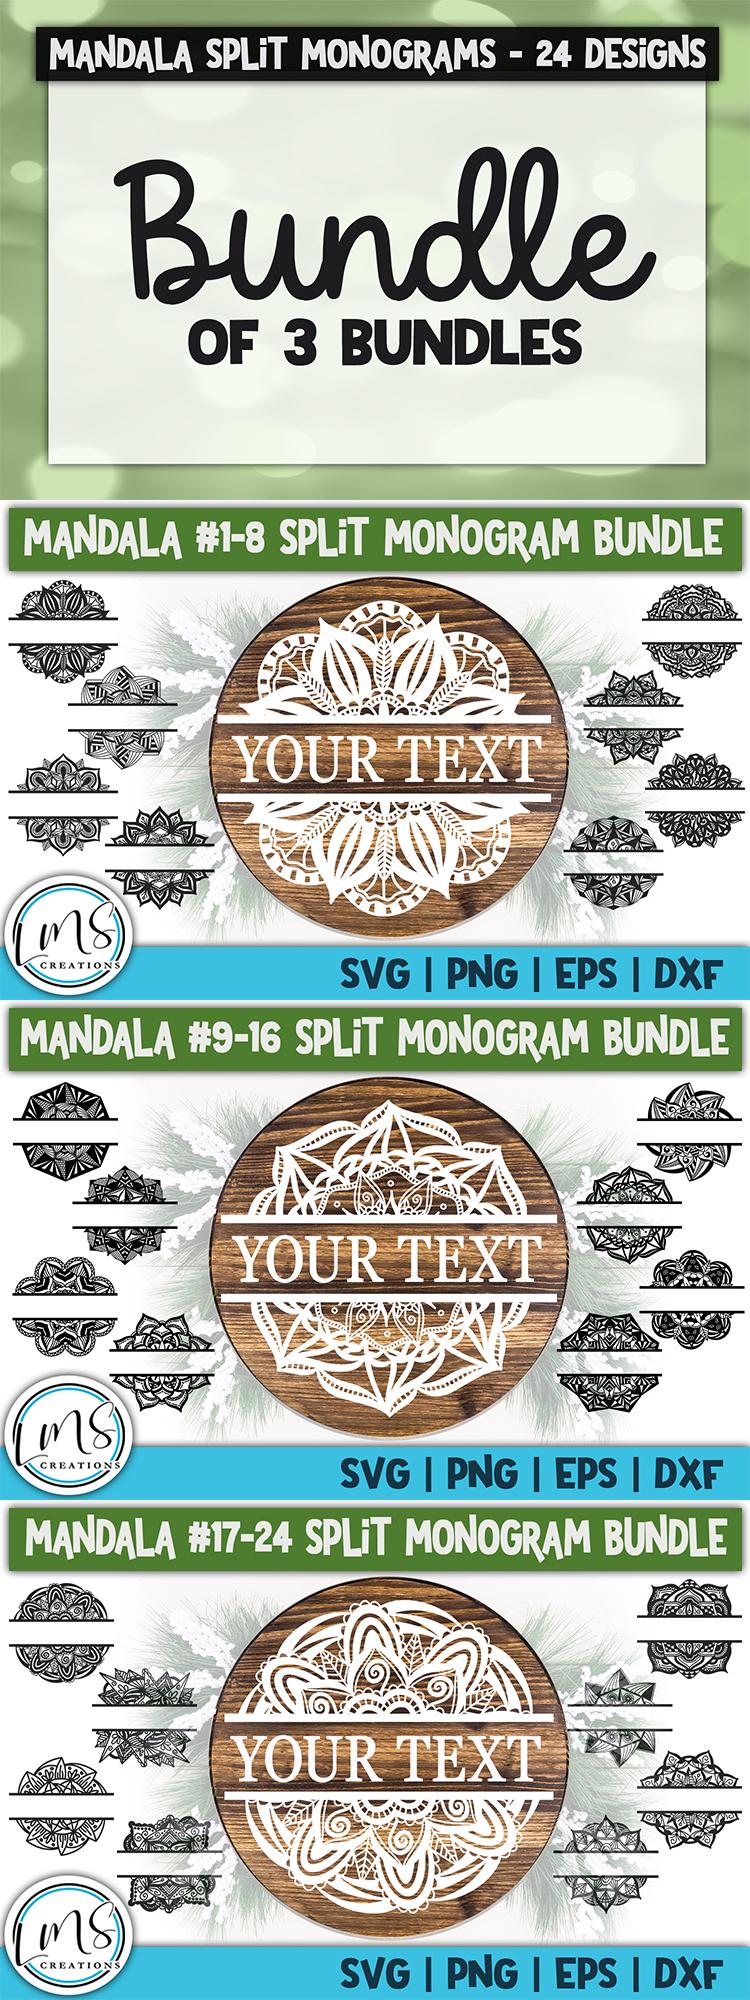 Split Mandala 1-24 Split Monogram Bundle SVG, PNG, EPS, DXF example image 6